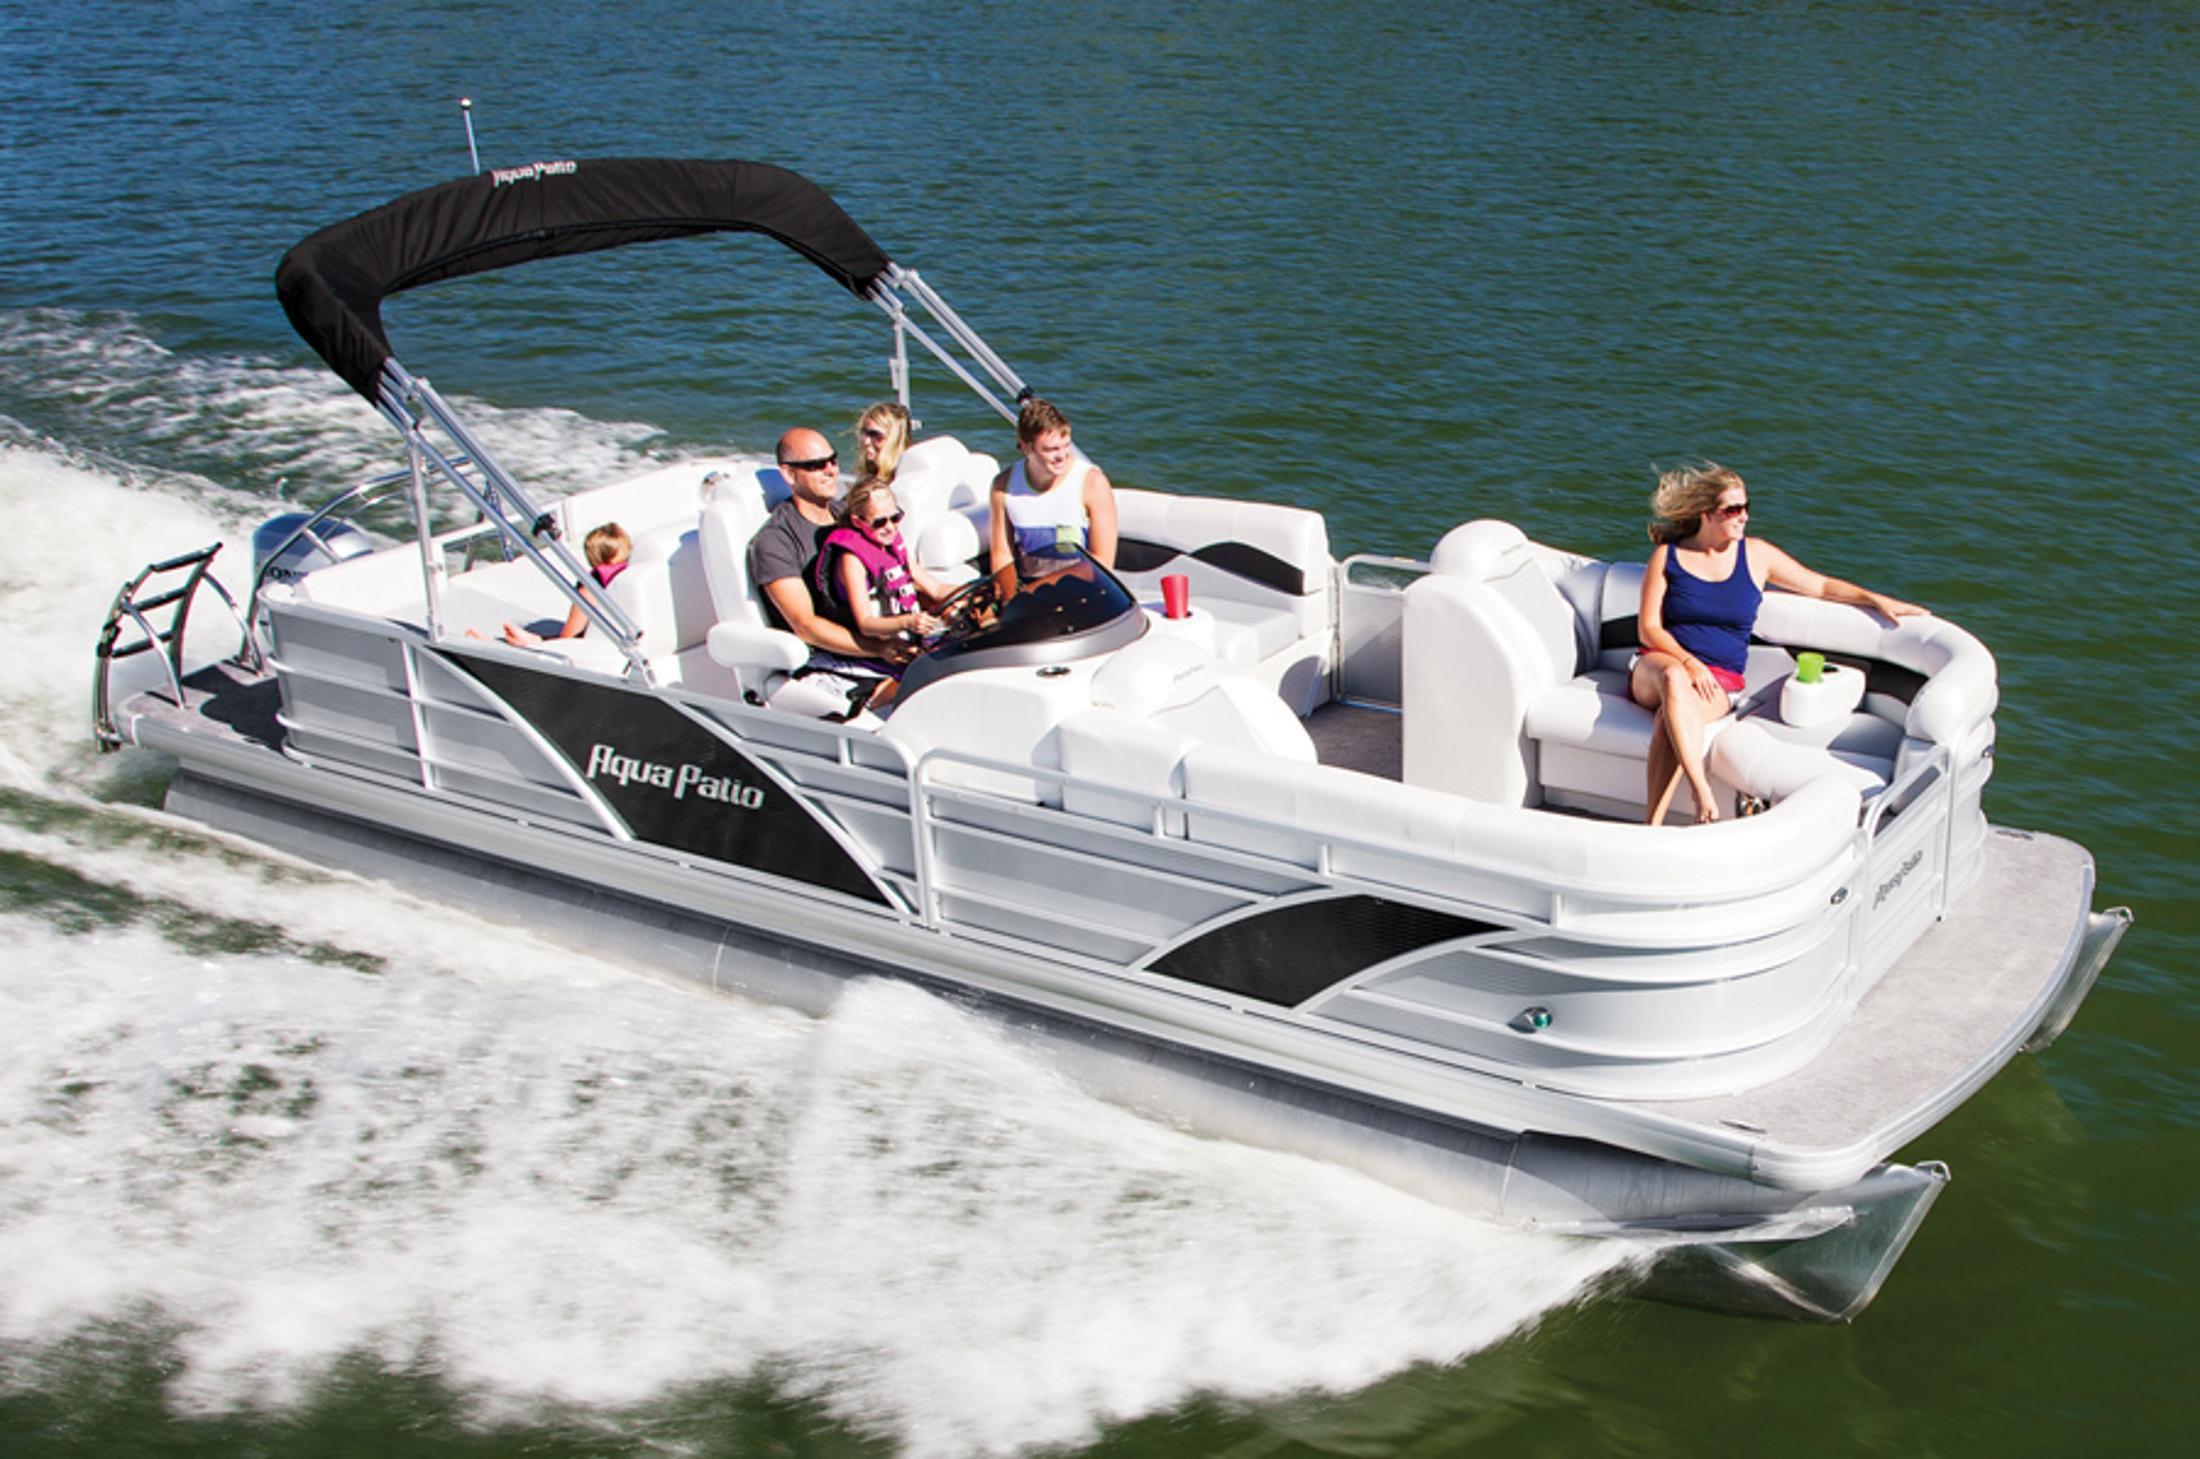 2013 Aqua Patio 240 SL Power Boats Inboard Niceville Florida 240SL2013